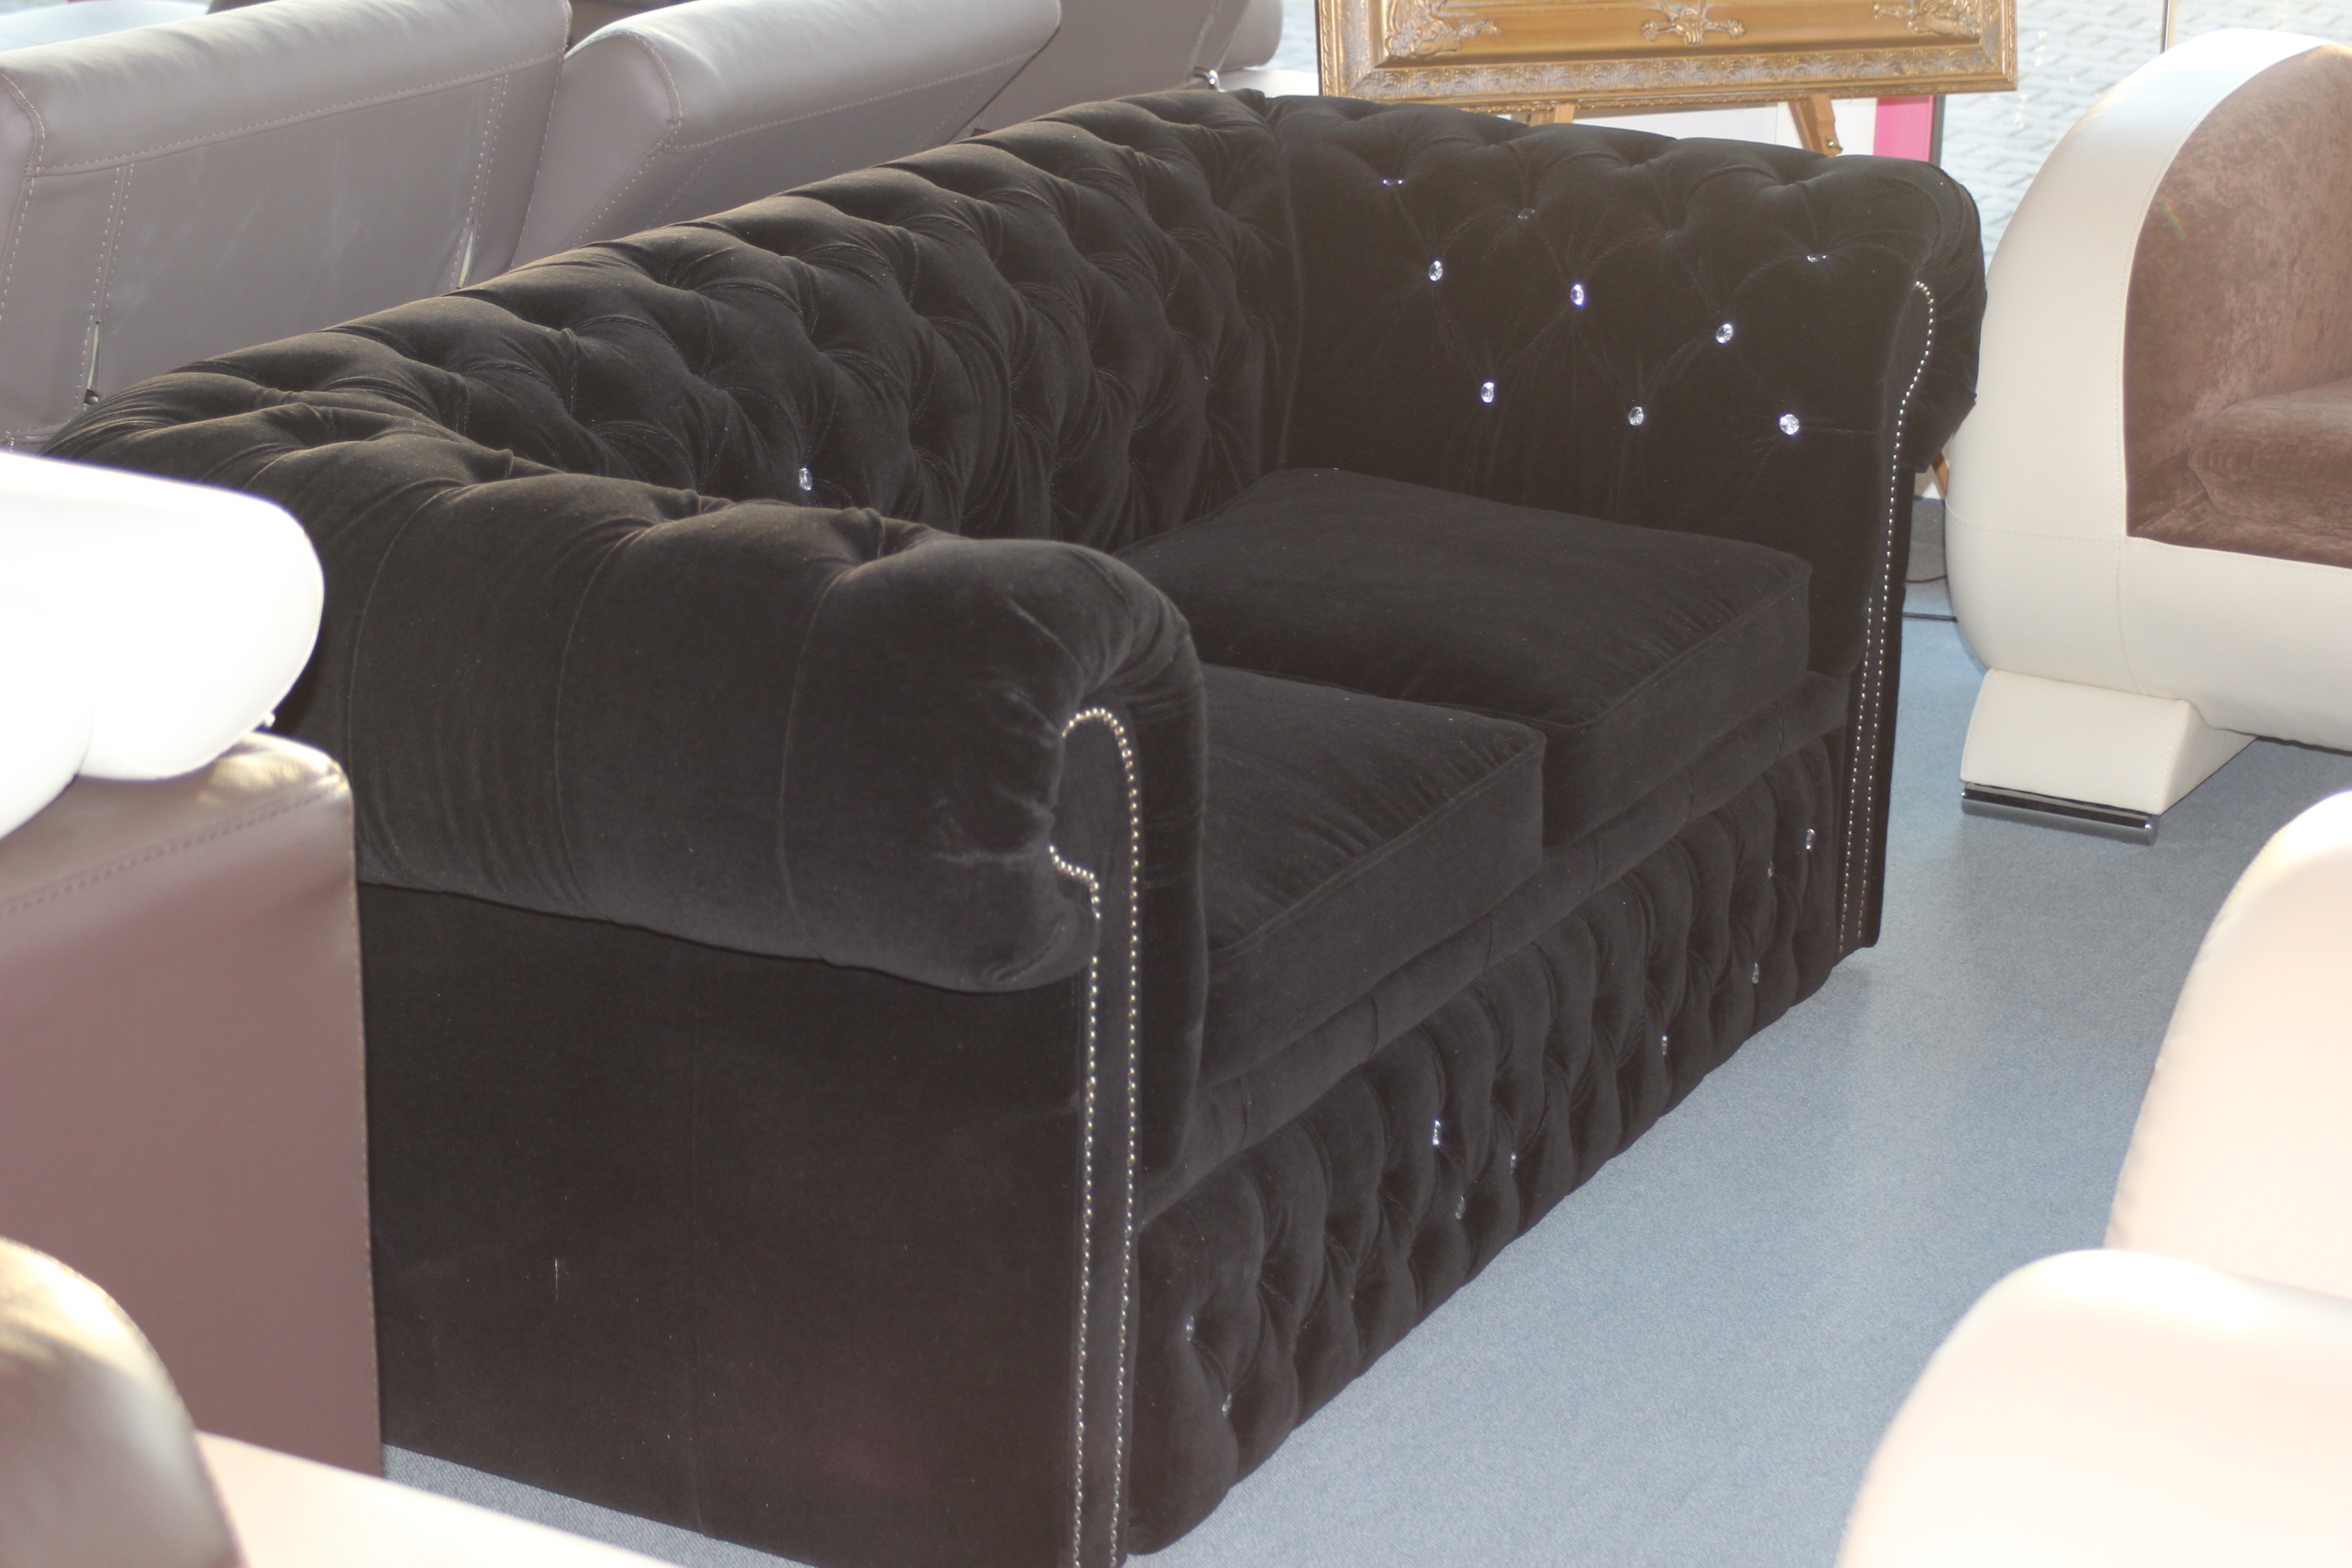 chesterfield sofas und ledersofas lagerware designersofa. Black Bedroom Furniture Sets. Home Design Ideas